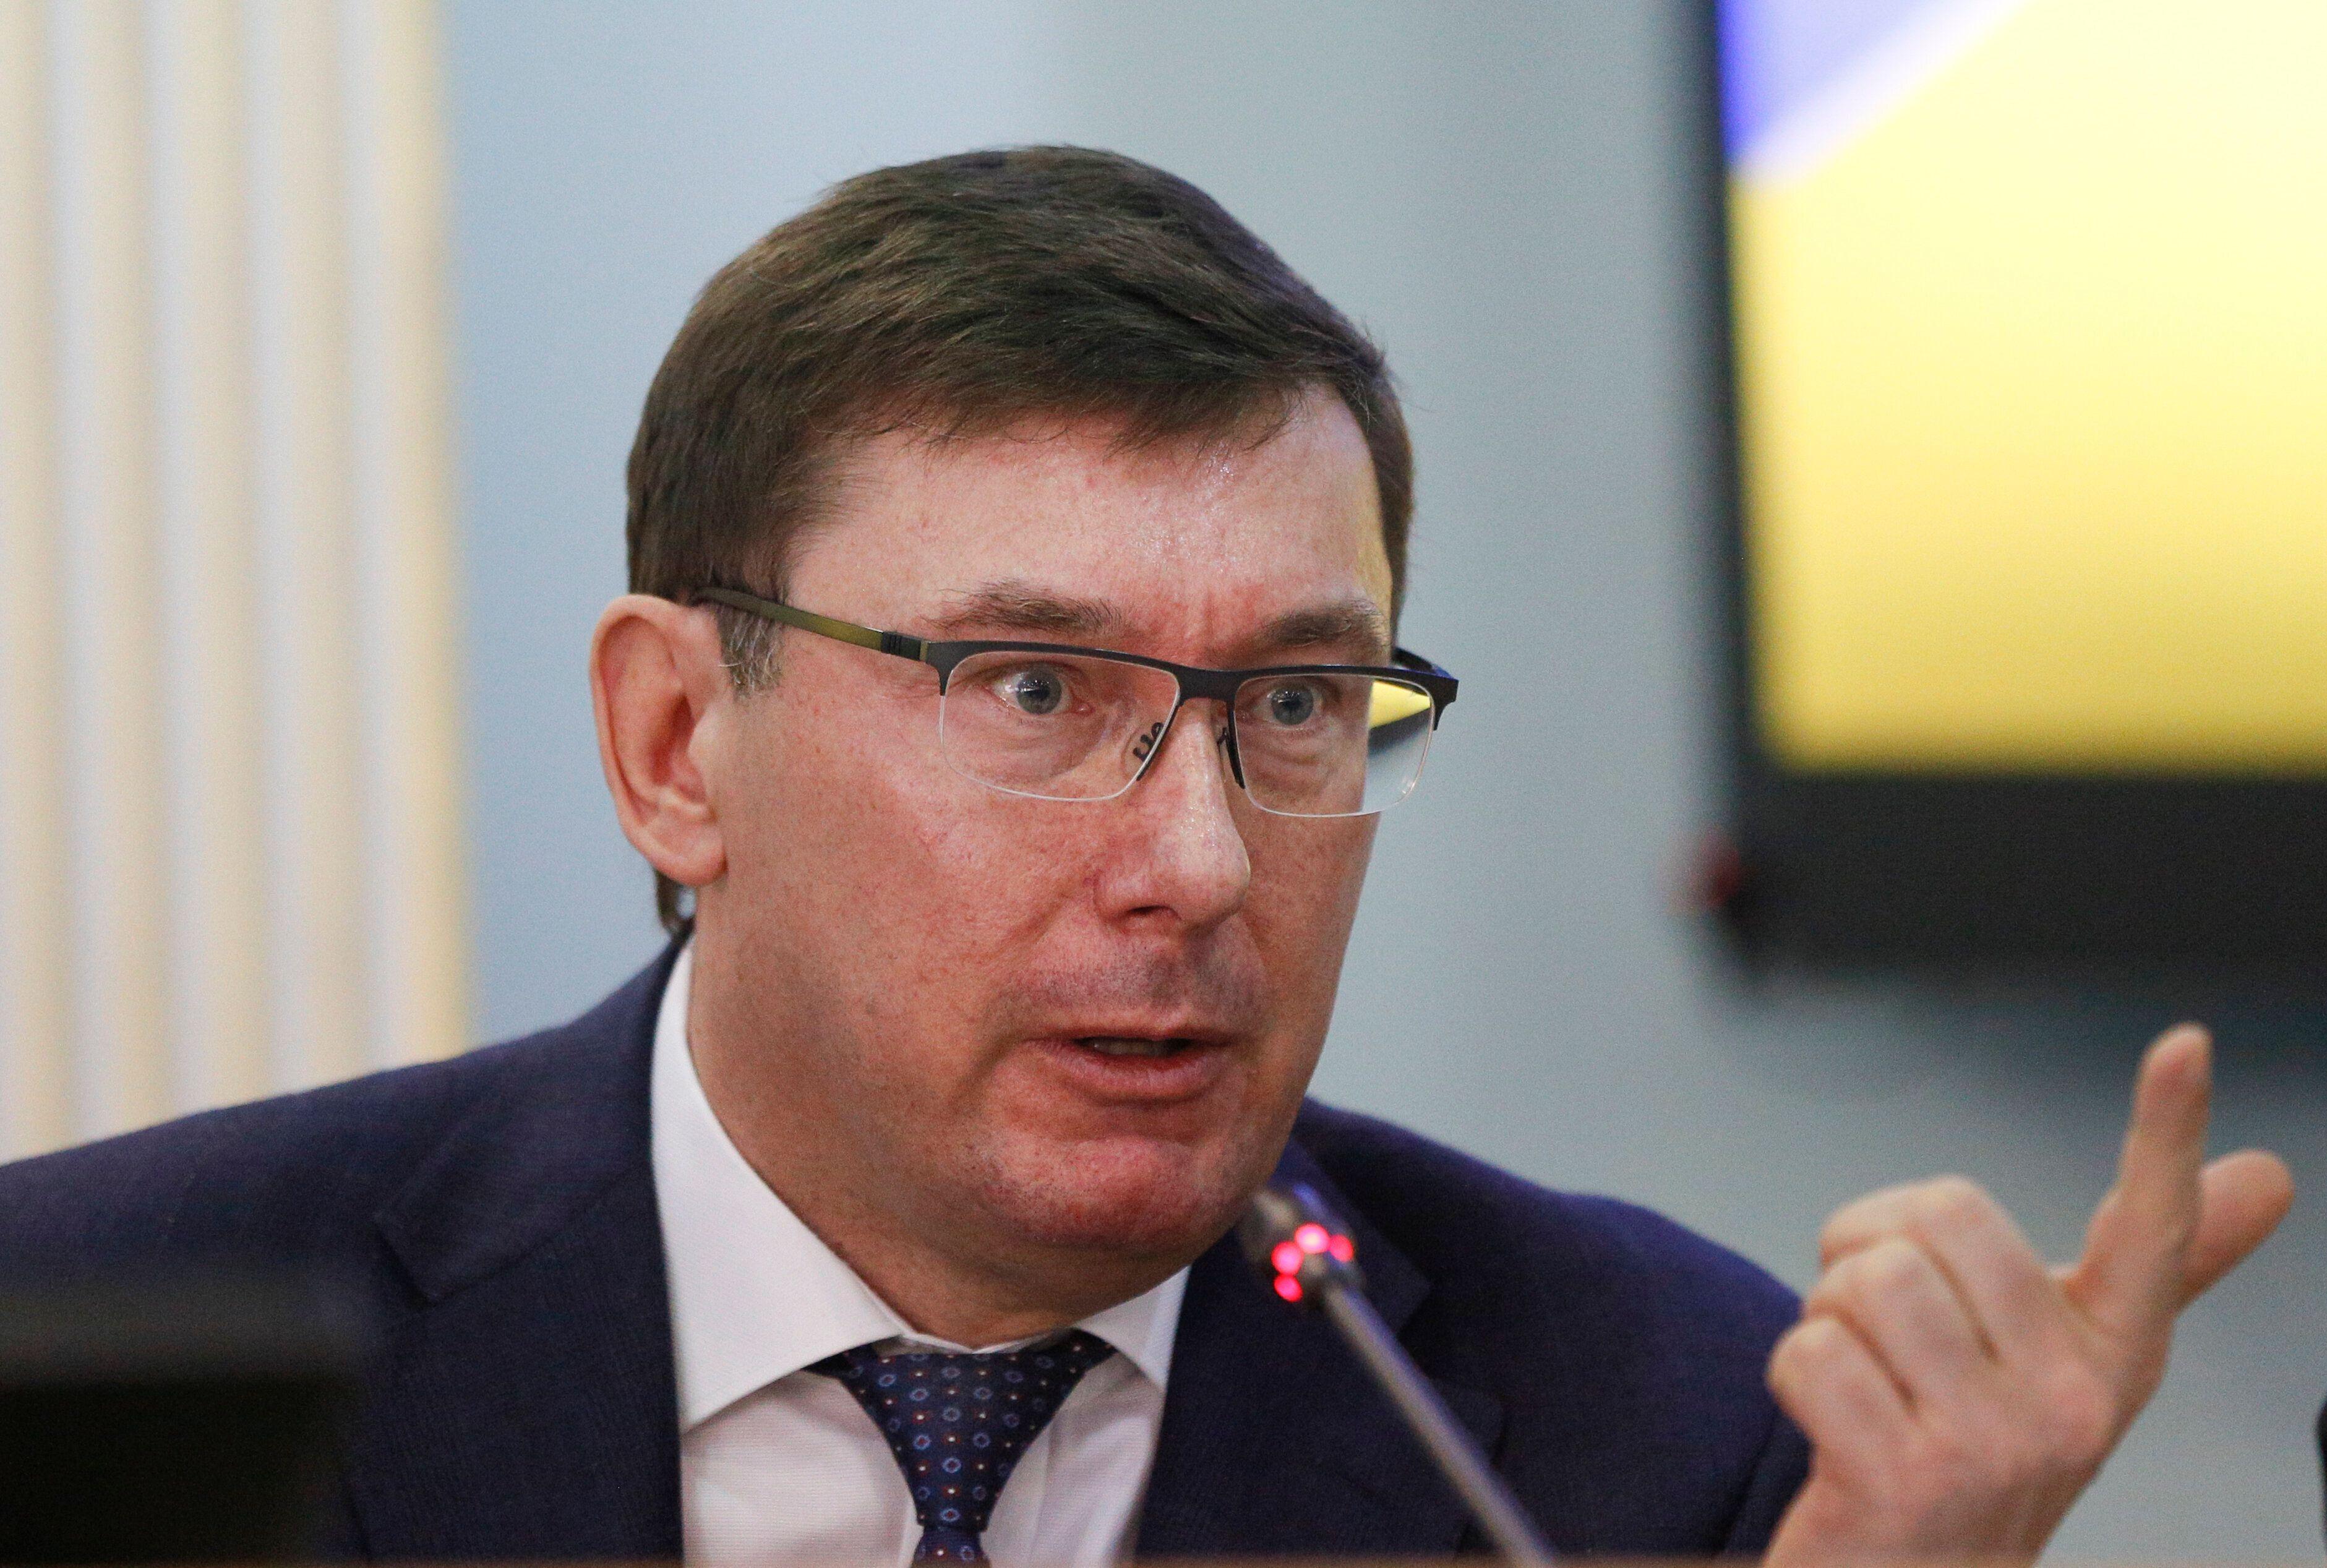 Ukrainian Prosecutor General Yuriy Lutsenko was involved in the ouster of U.S. Ambassador Marie Yovanovitch.